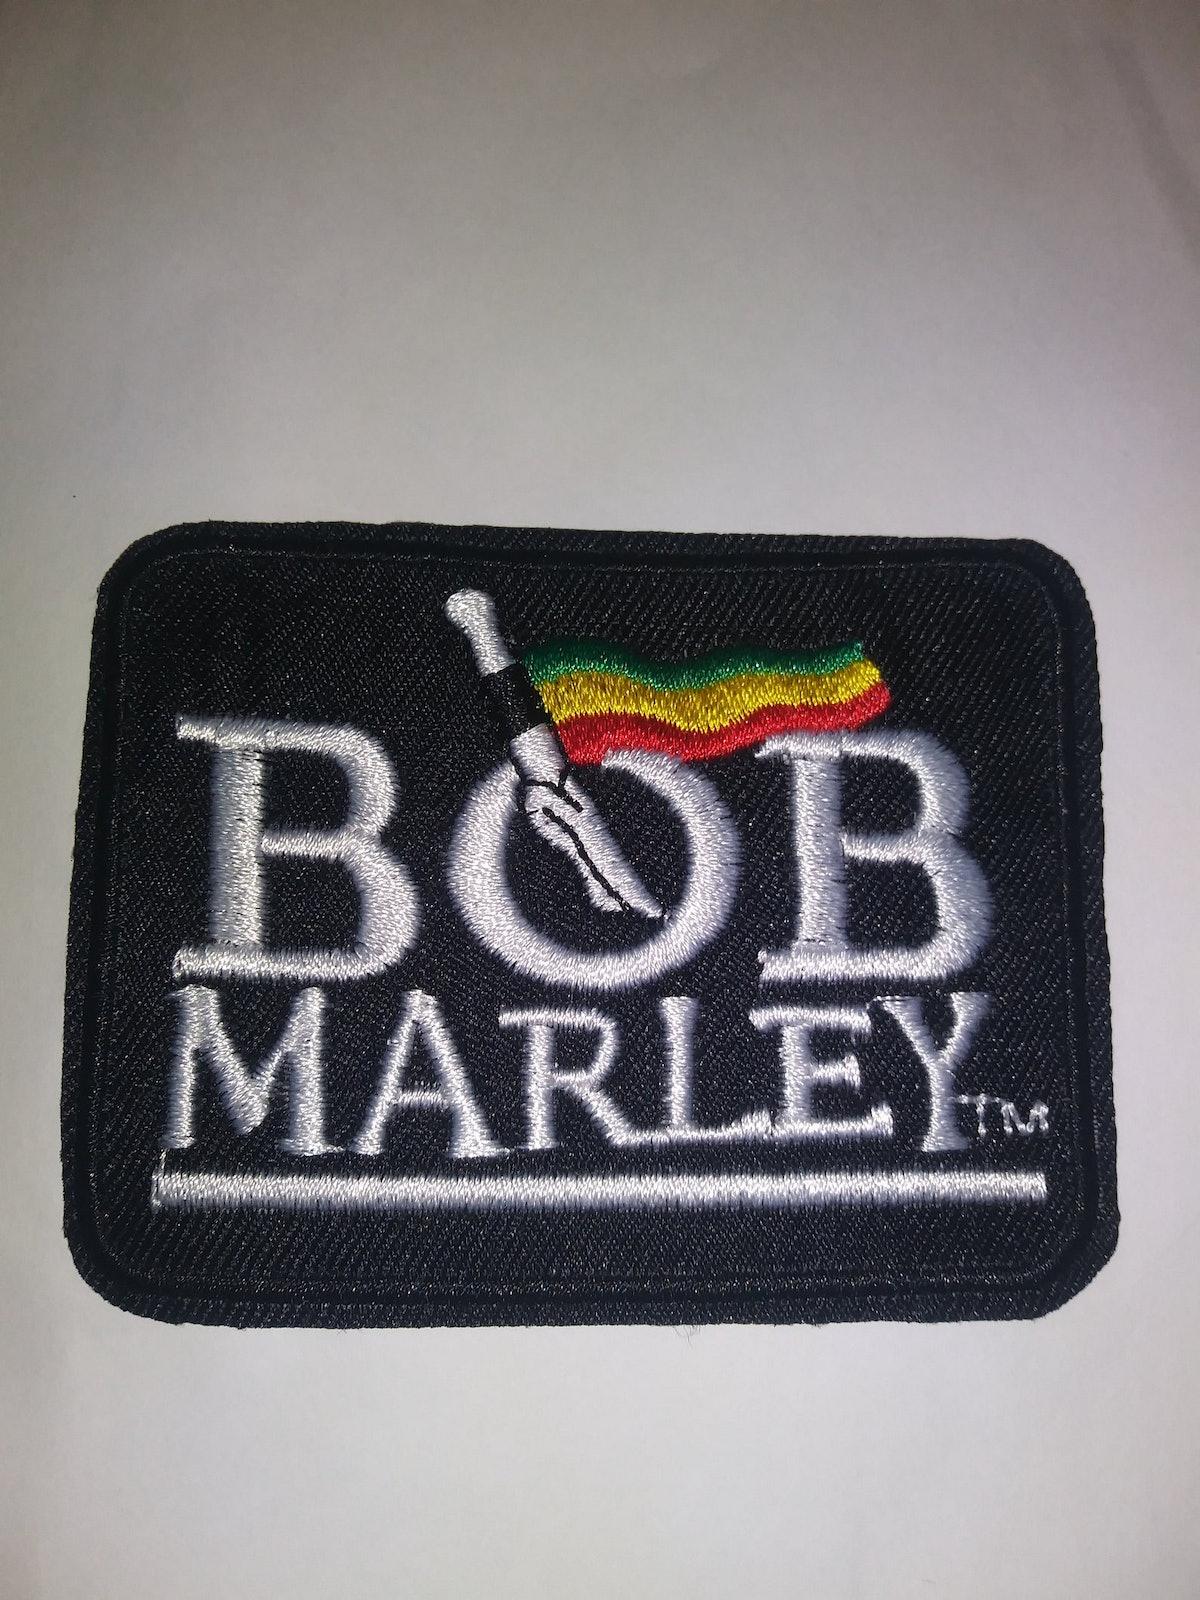 Bob Marley Iron On Patch